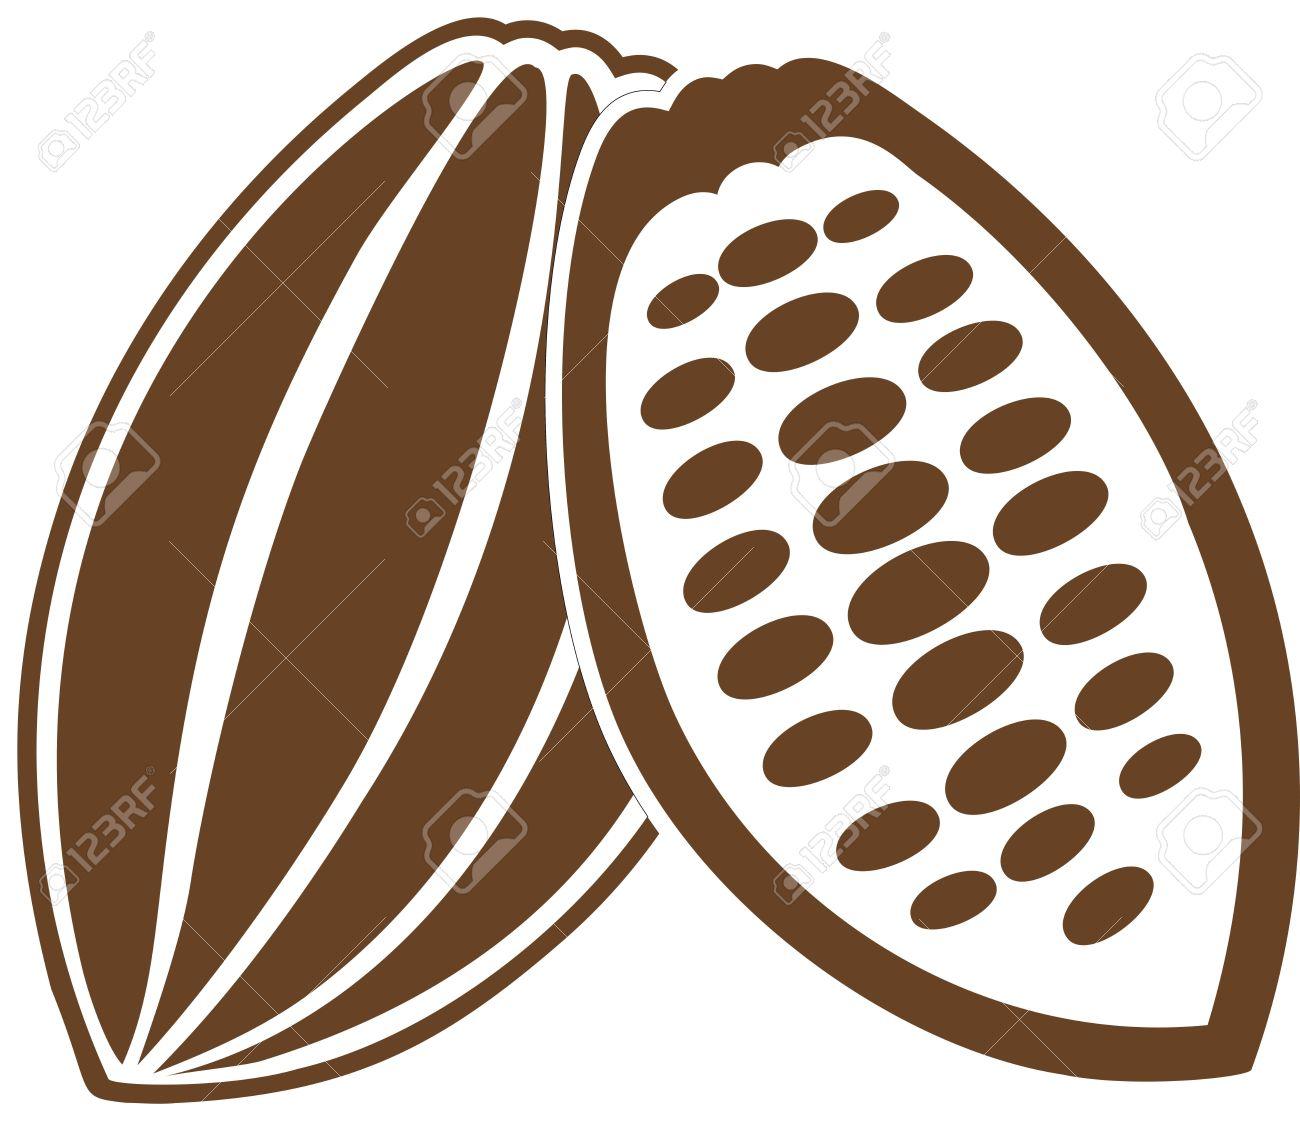 Bean clipart cocoa bean Green Cocoa Leaves beans collection